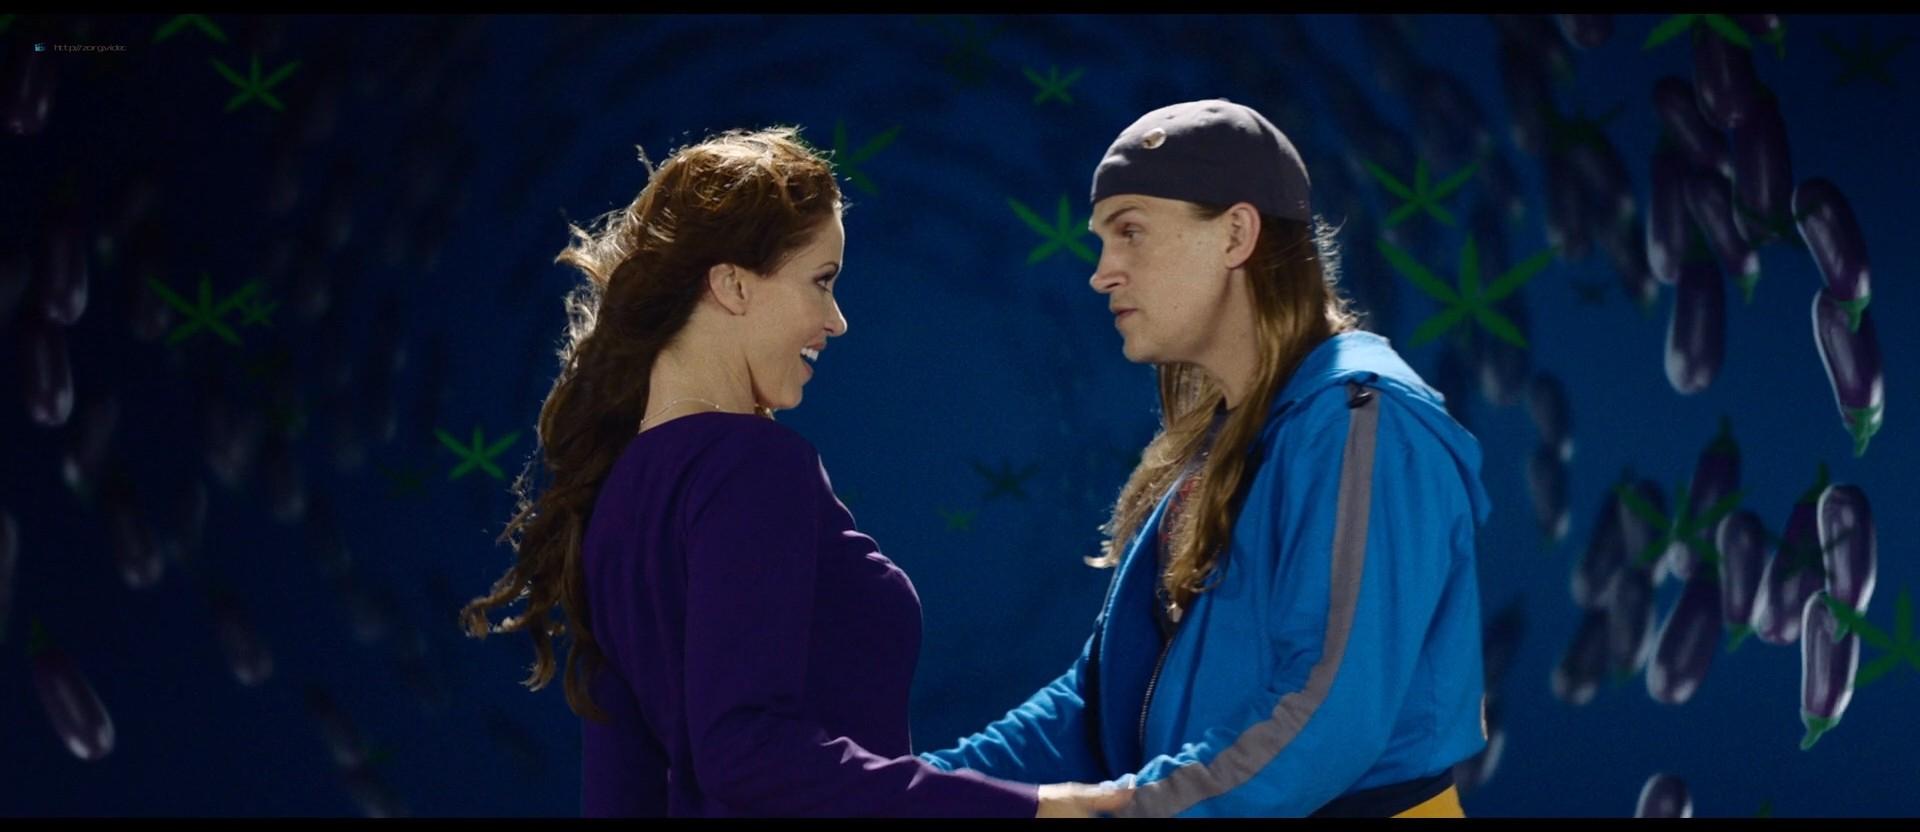 Melissa Benoist hot Shannon Elizabeth sexy - Jay and Silent Bob Reboot (2019) HD 1080p BluRay (15)